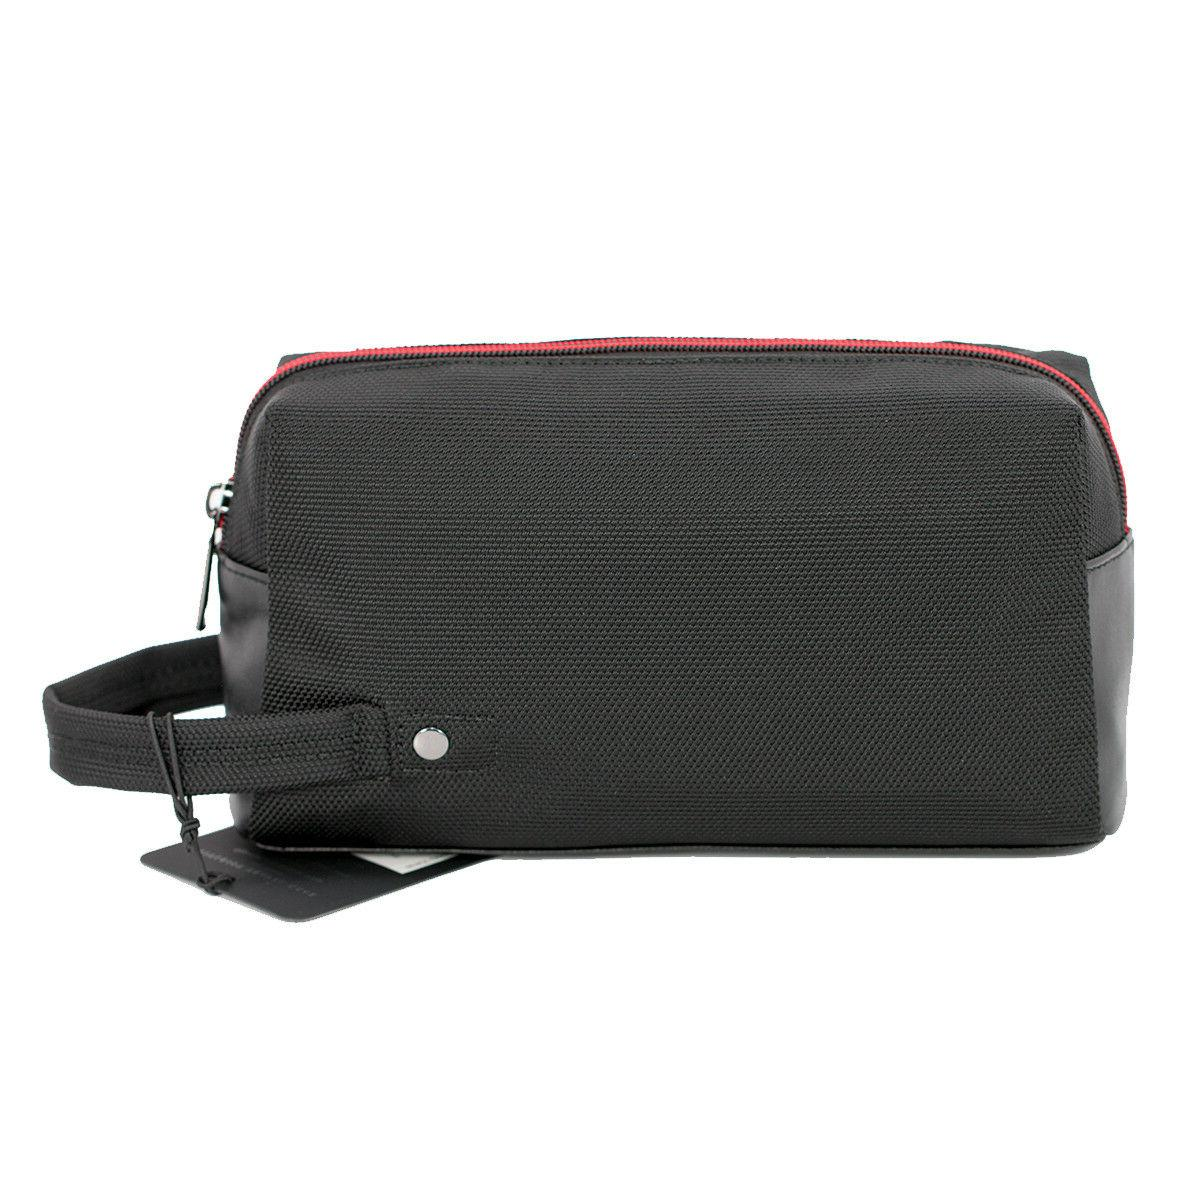 NEW Titleist Travel Gear Bag Pouch Black